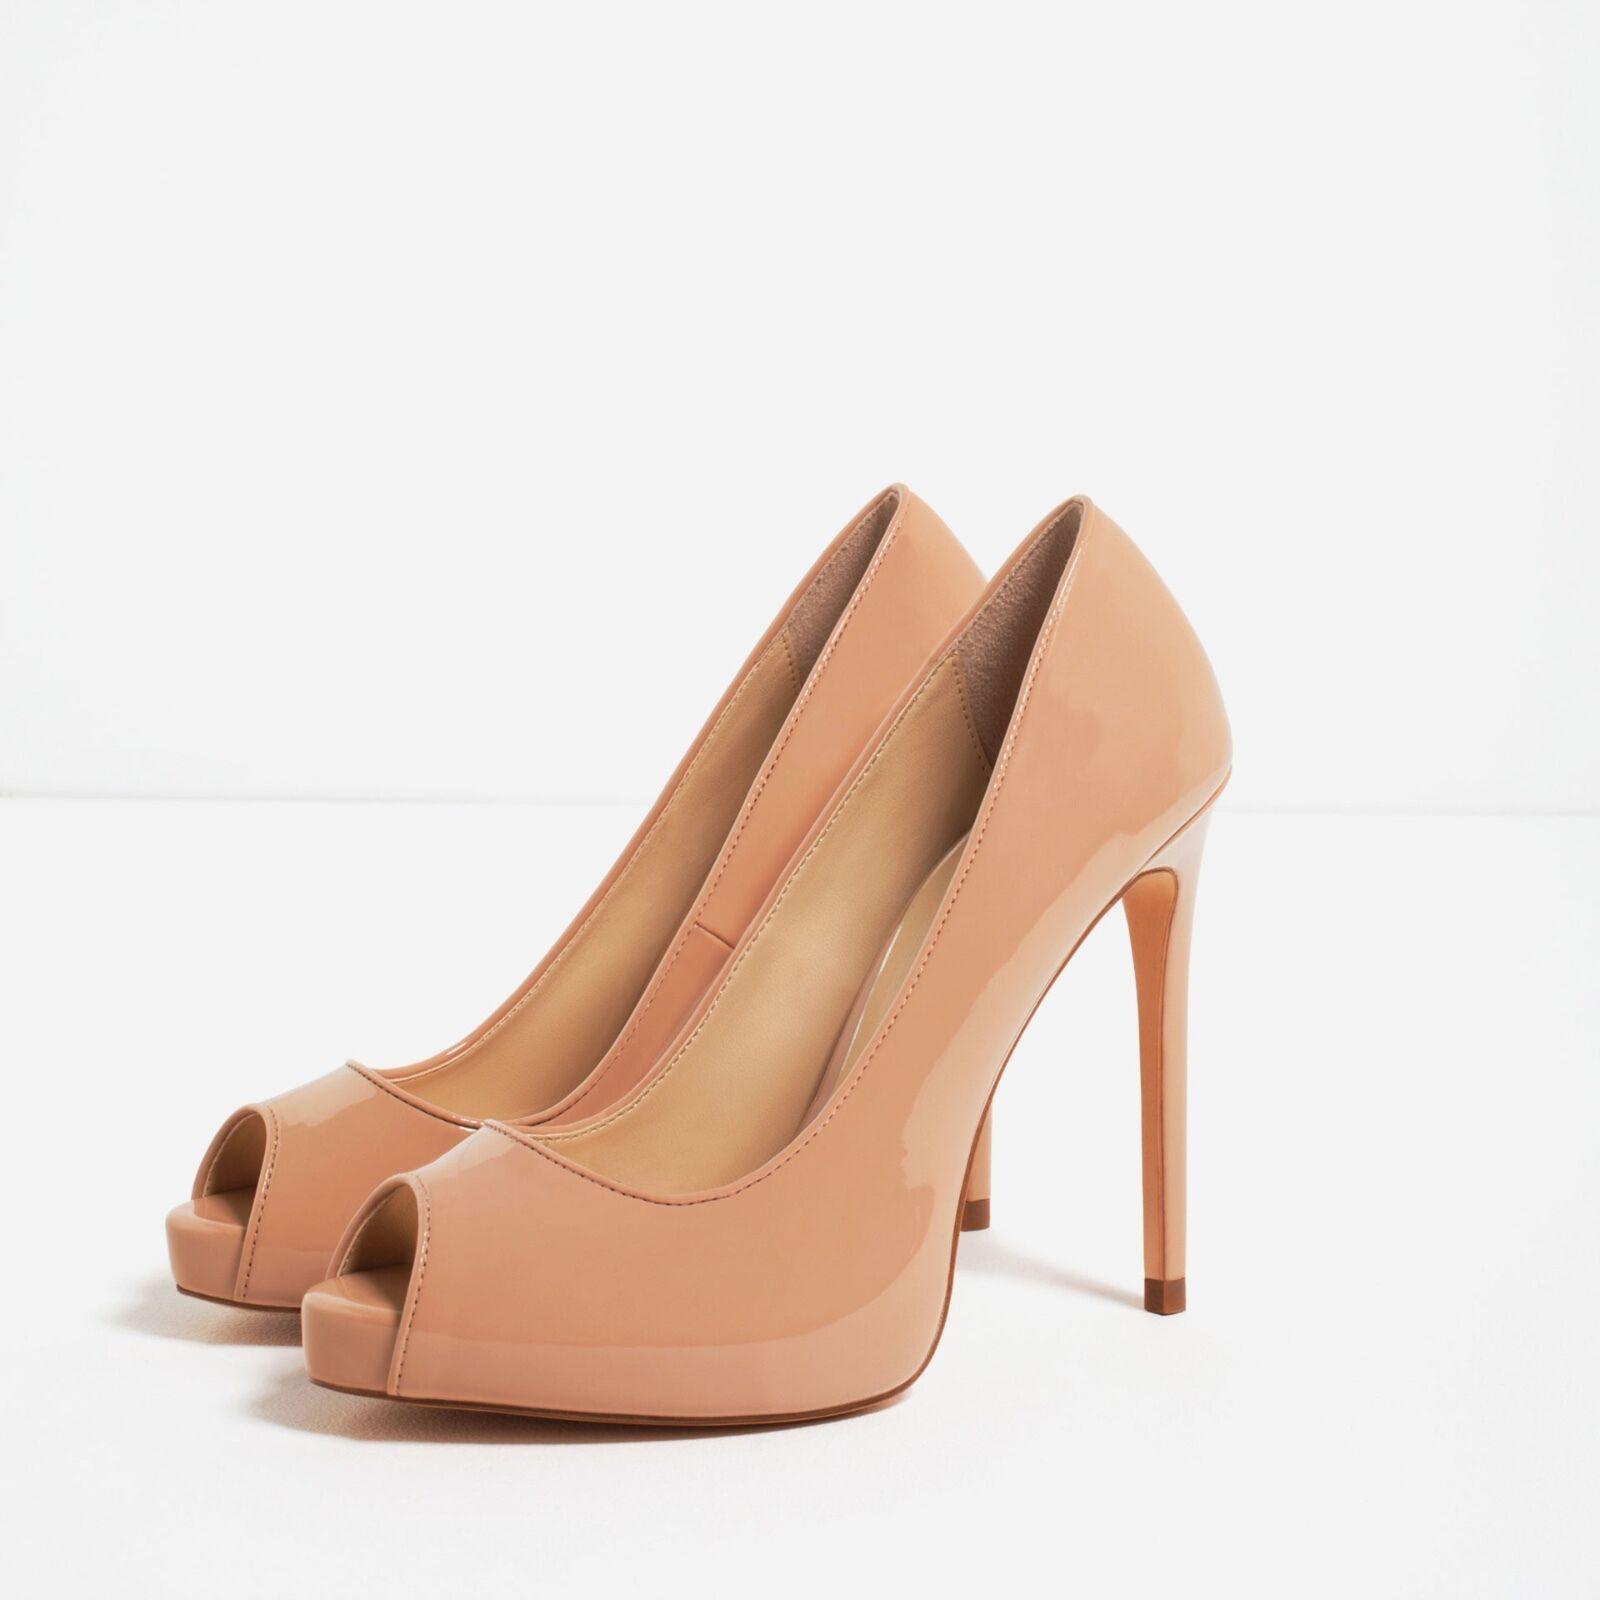 Zara Nude Nude Nude Patent Finish High Heel schuhe, Größe 40 cdb78f